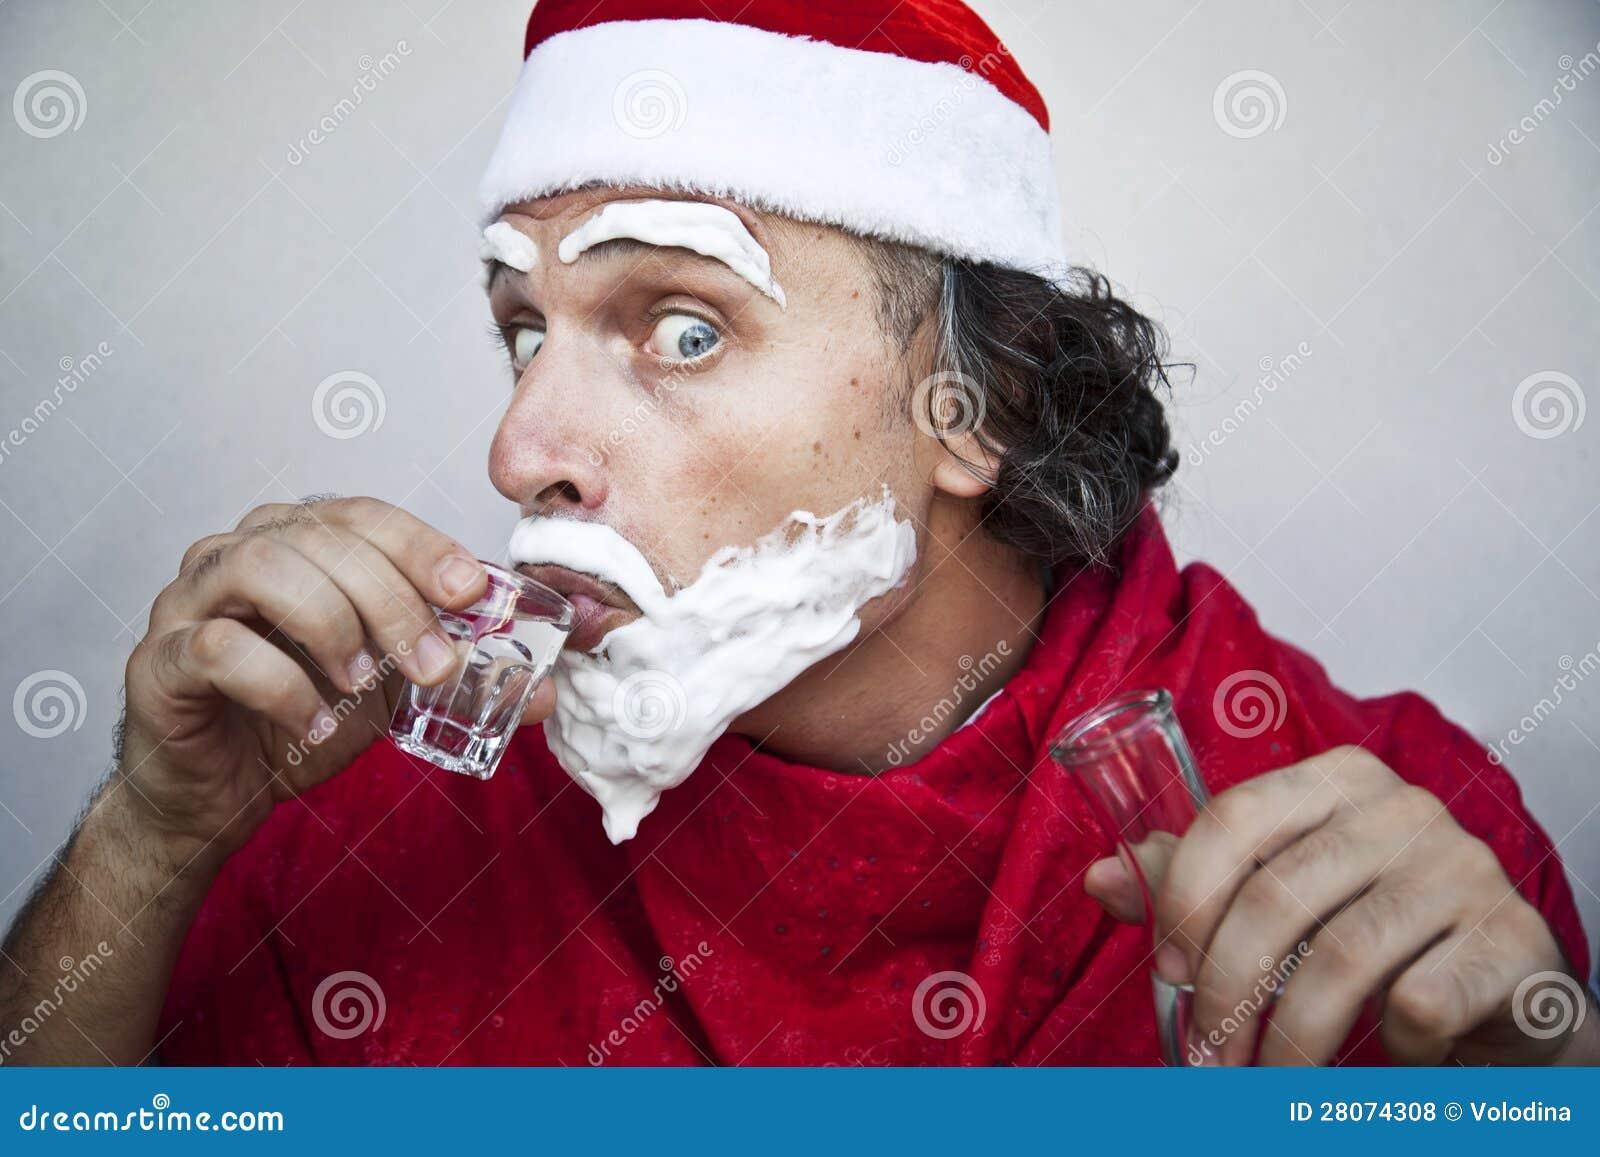 Very bad santa claus royalty free stock photos image